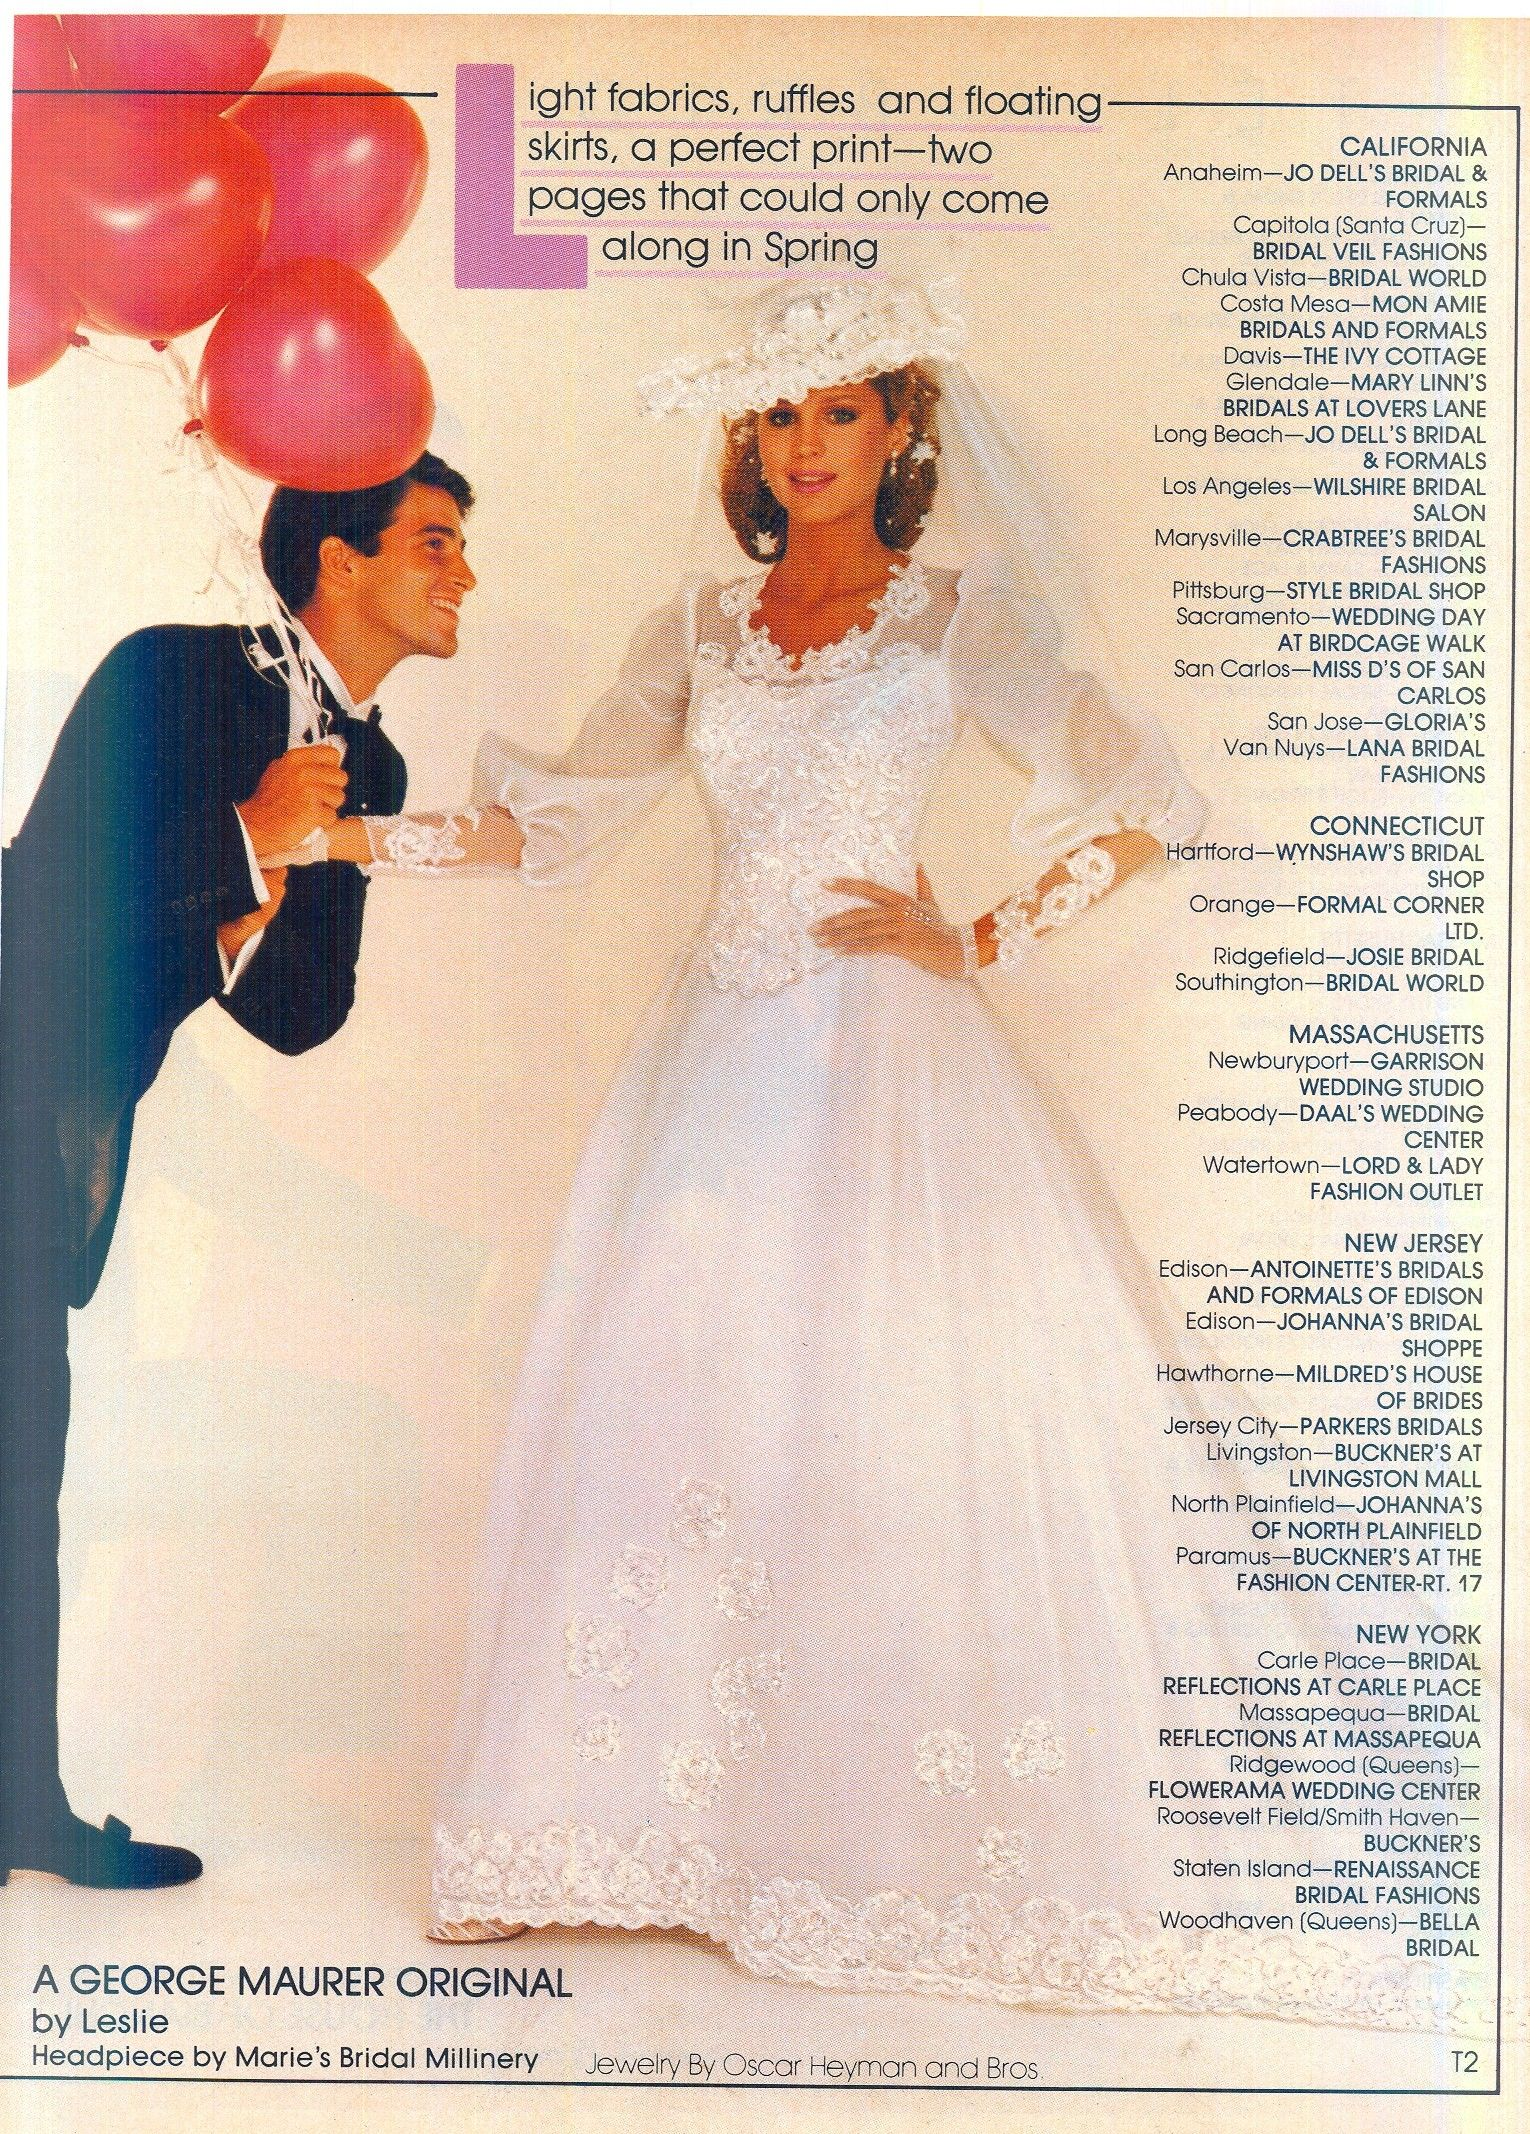 Modern Bride December 1982 January 1983 Bride Dress Vintage Wedding Dresses Vintage 1980s Wedding Dress